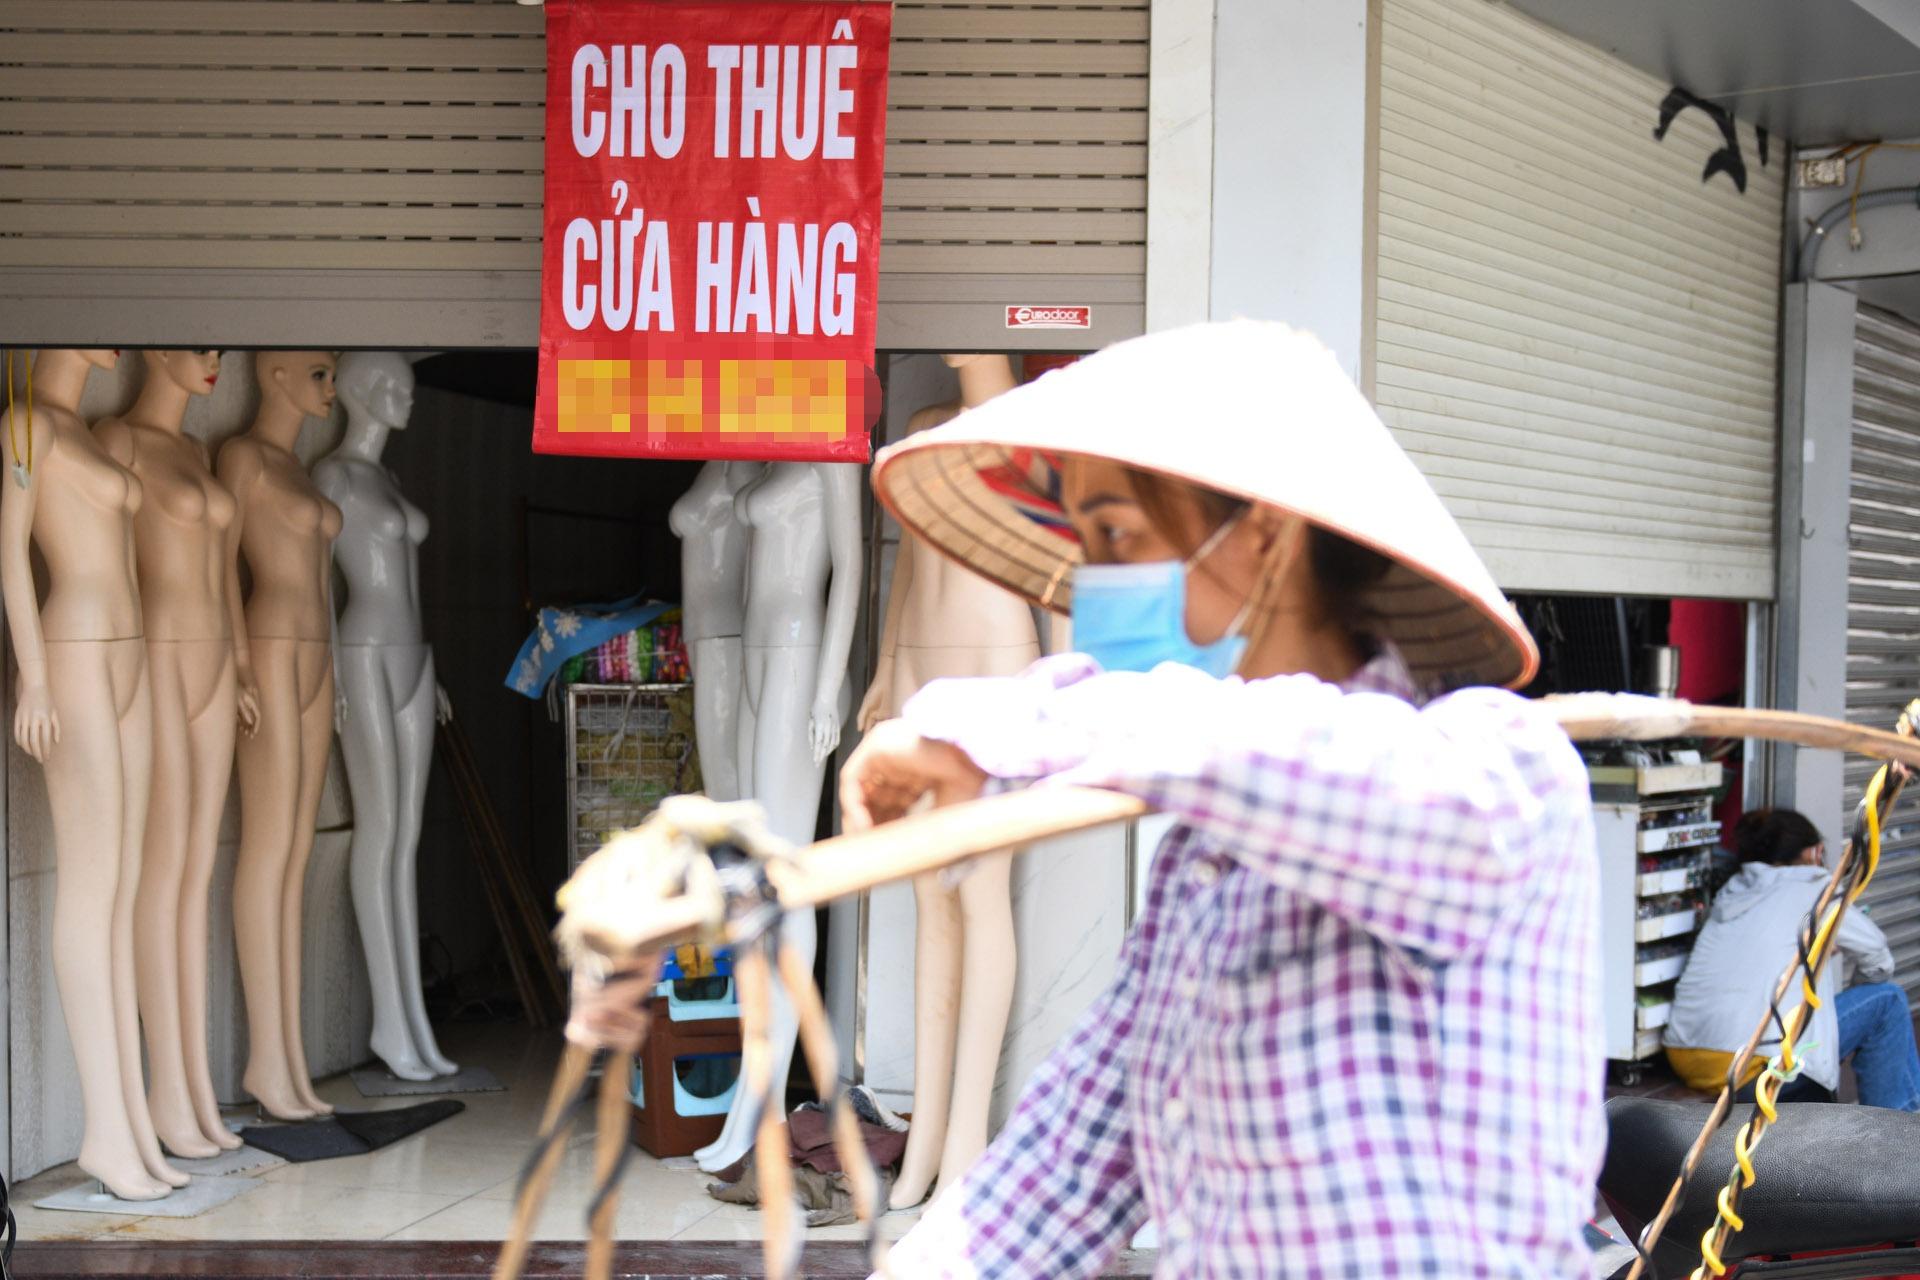 Cho thue nha Ha Noi, mat bang pho co anh 7